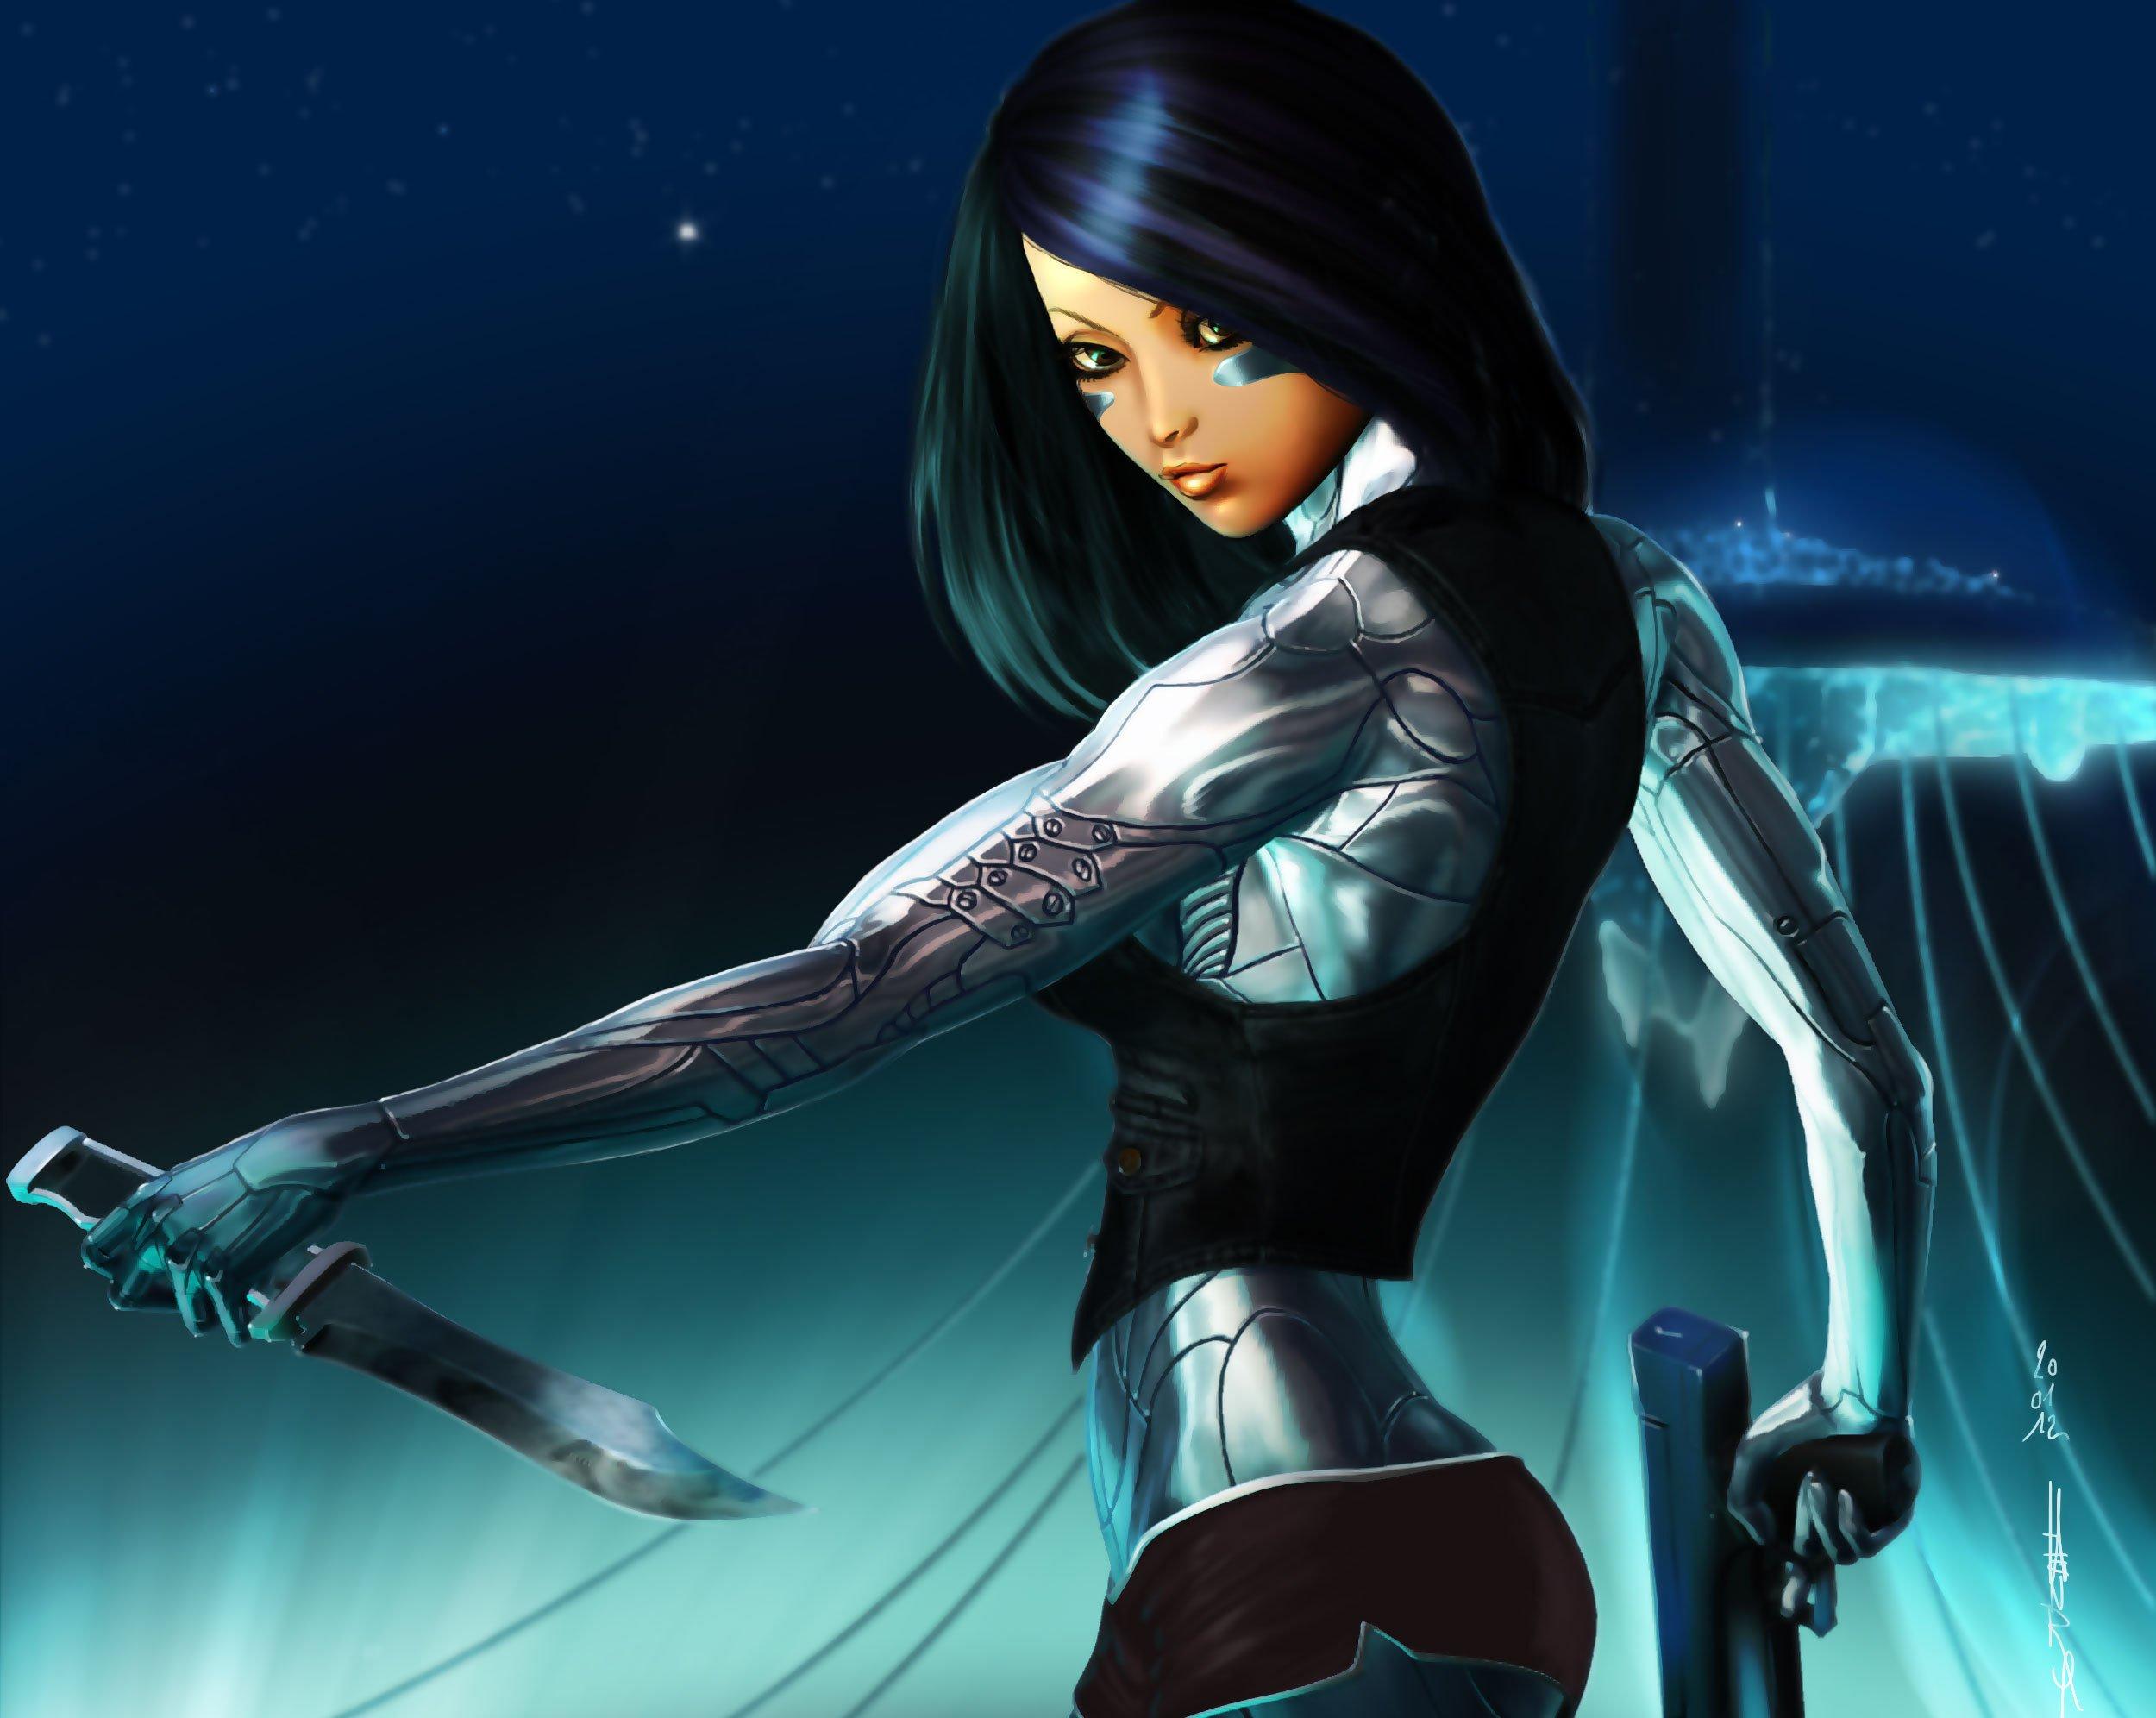 Girl Fantasy Art Weapon Gun Knife Warrior Cyborg Robot Sci